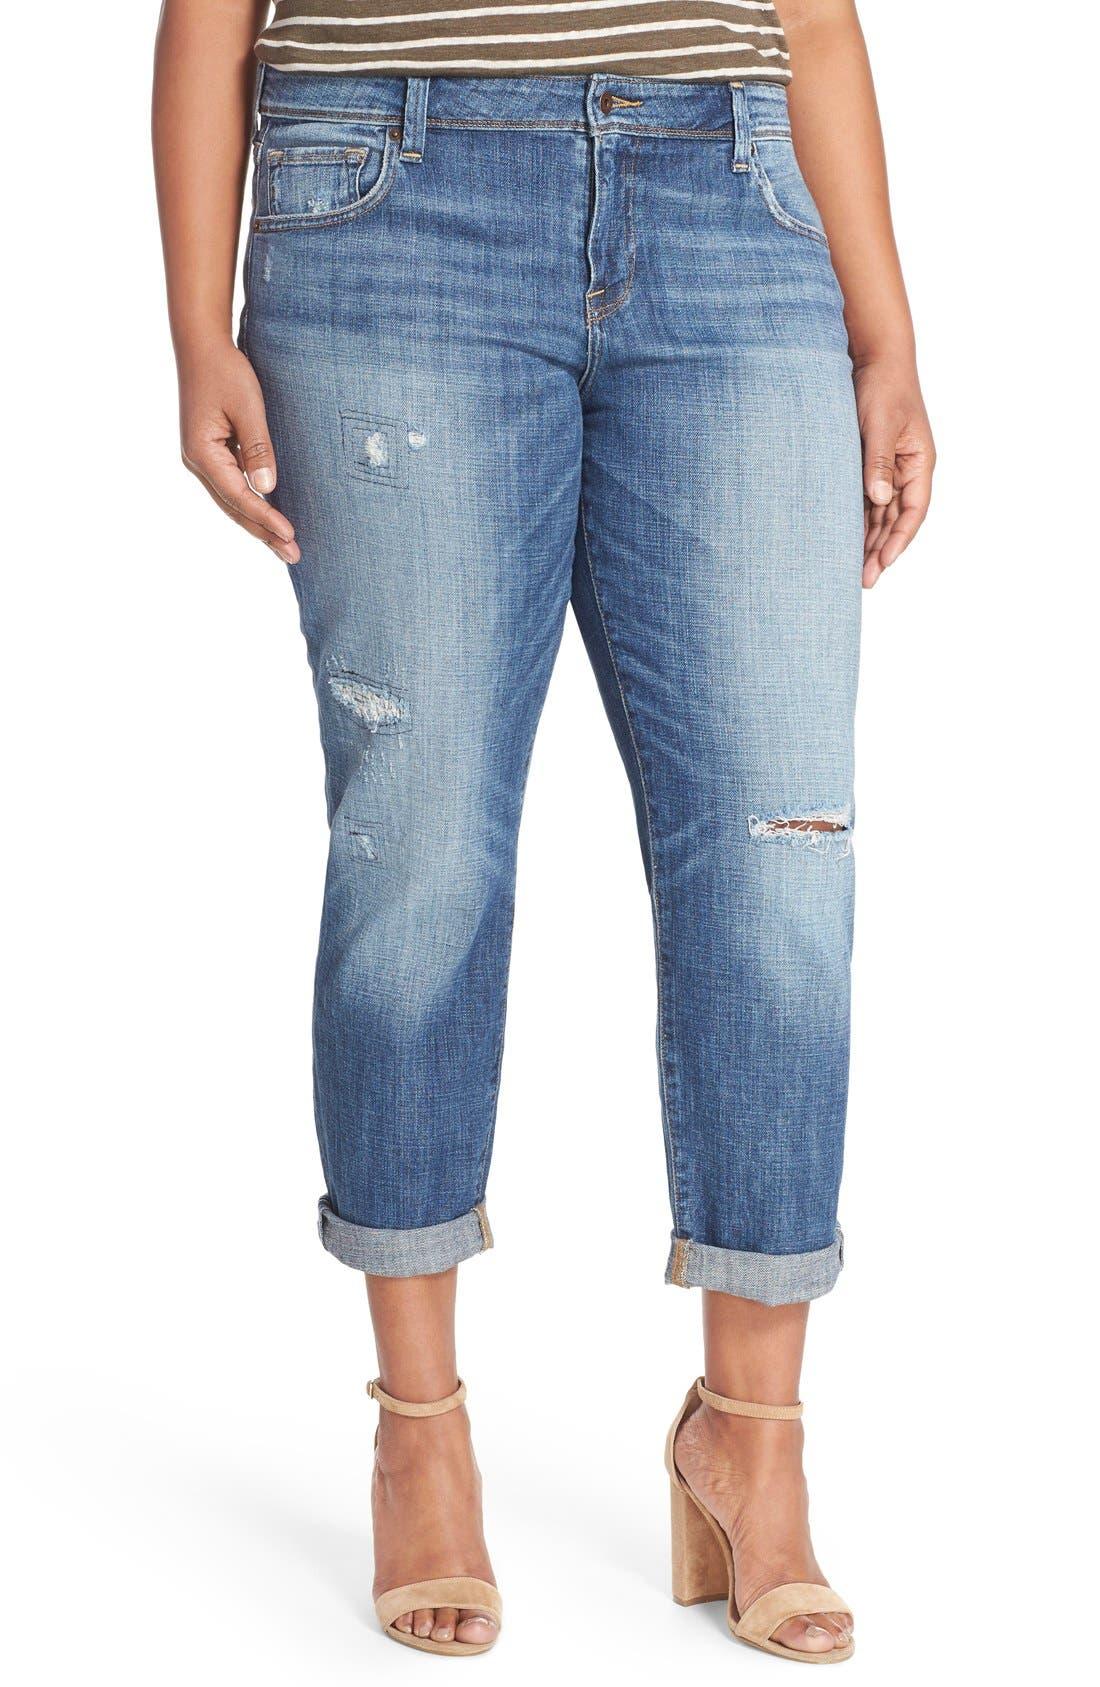 Lucky Brand Reese Distressed Boyfriend Jeans (Northridge Park) (Plus Size)